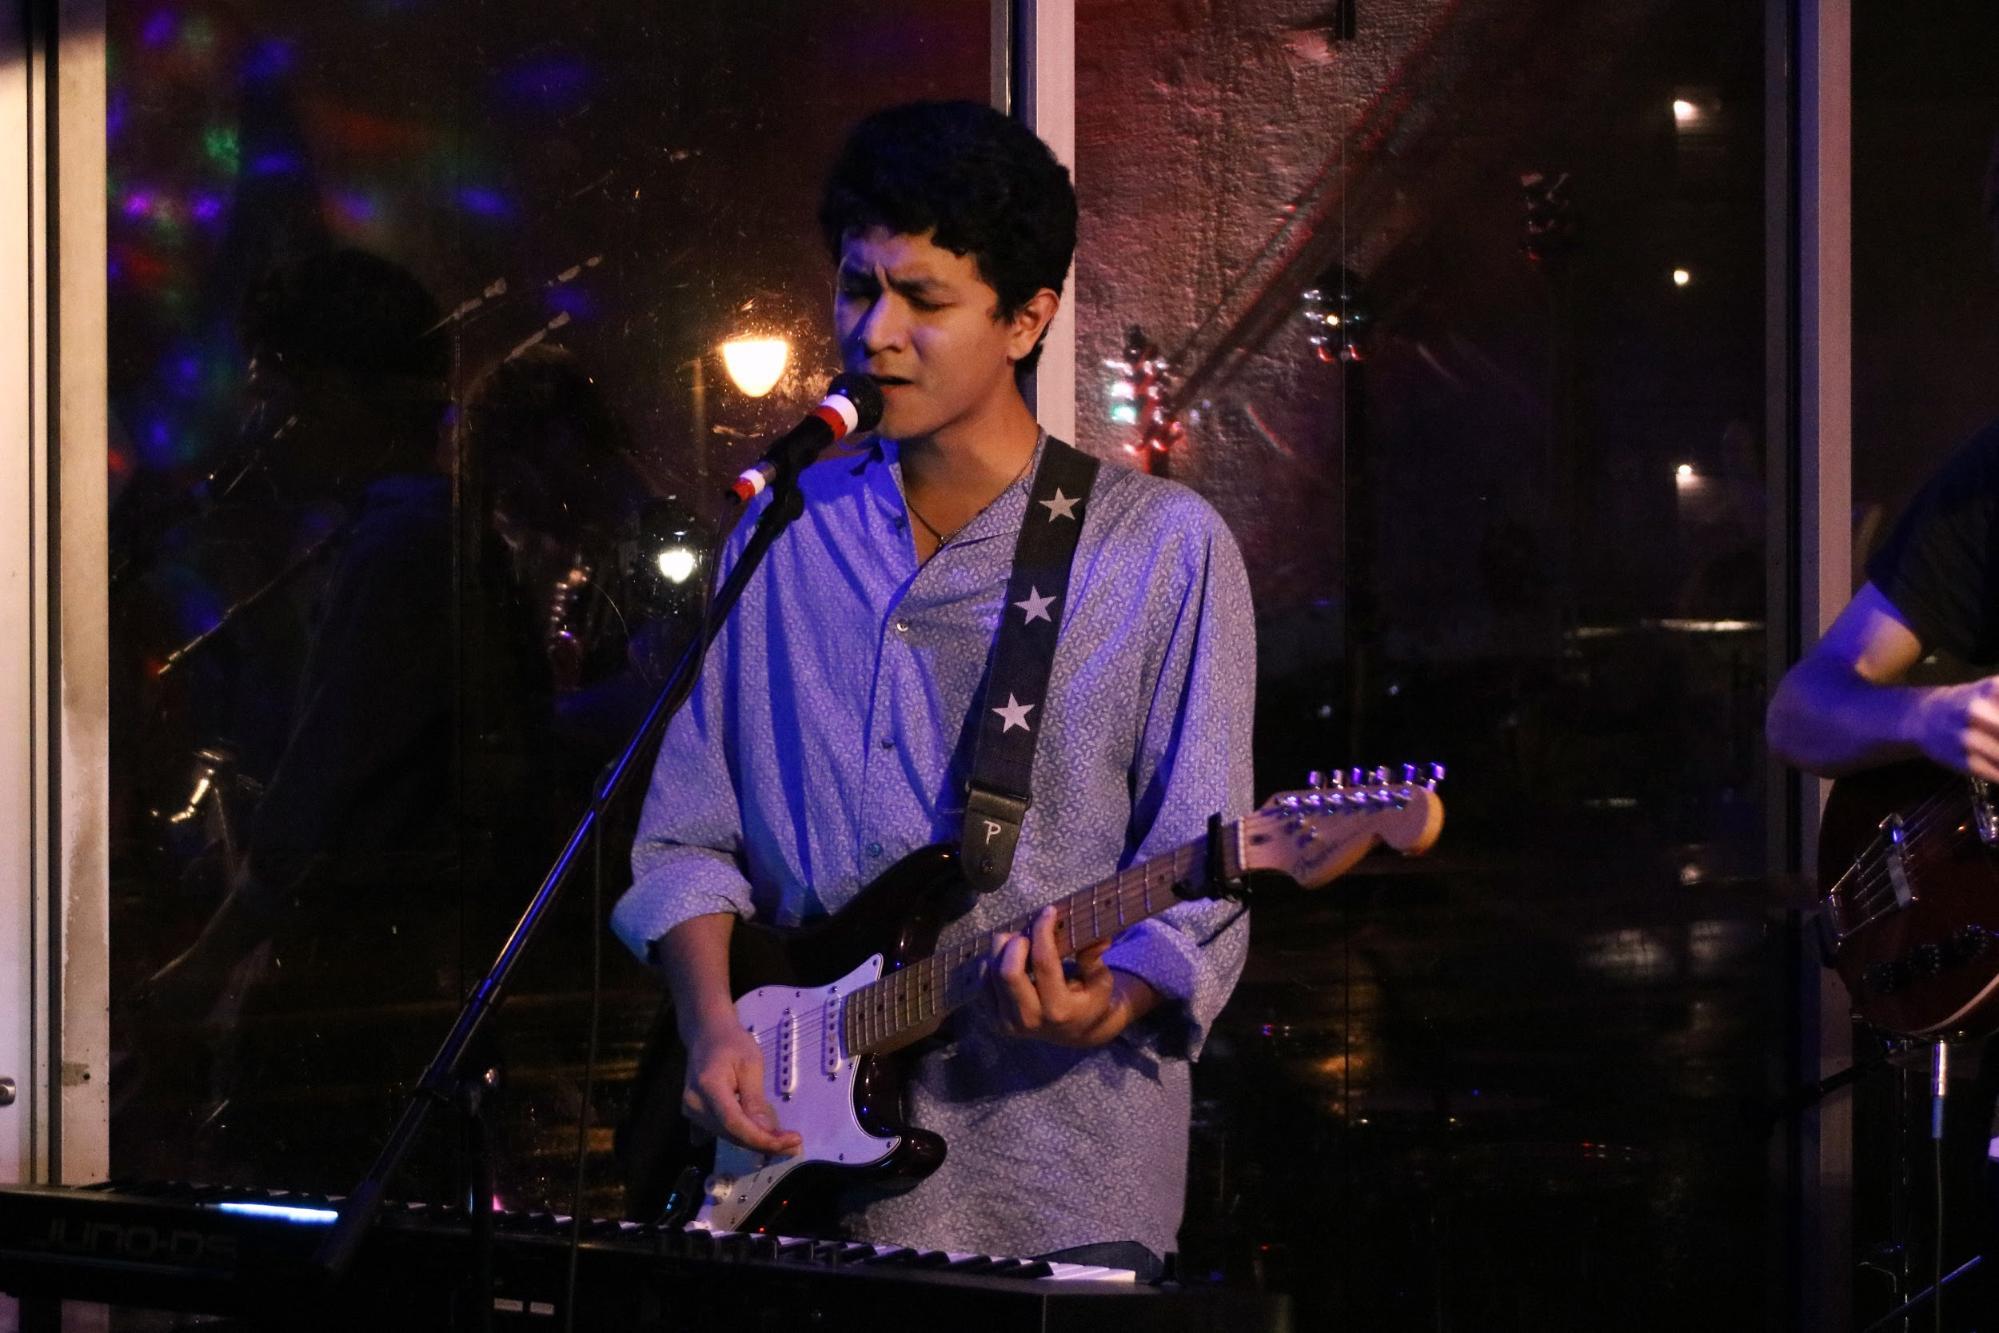 Guitarist/singer Marco Martinez